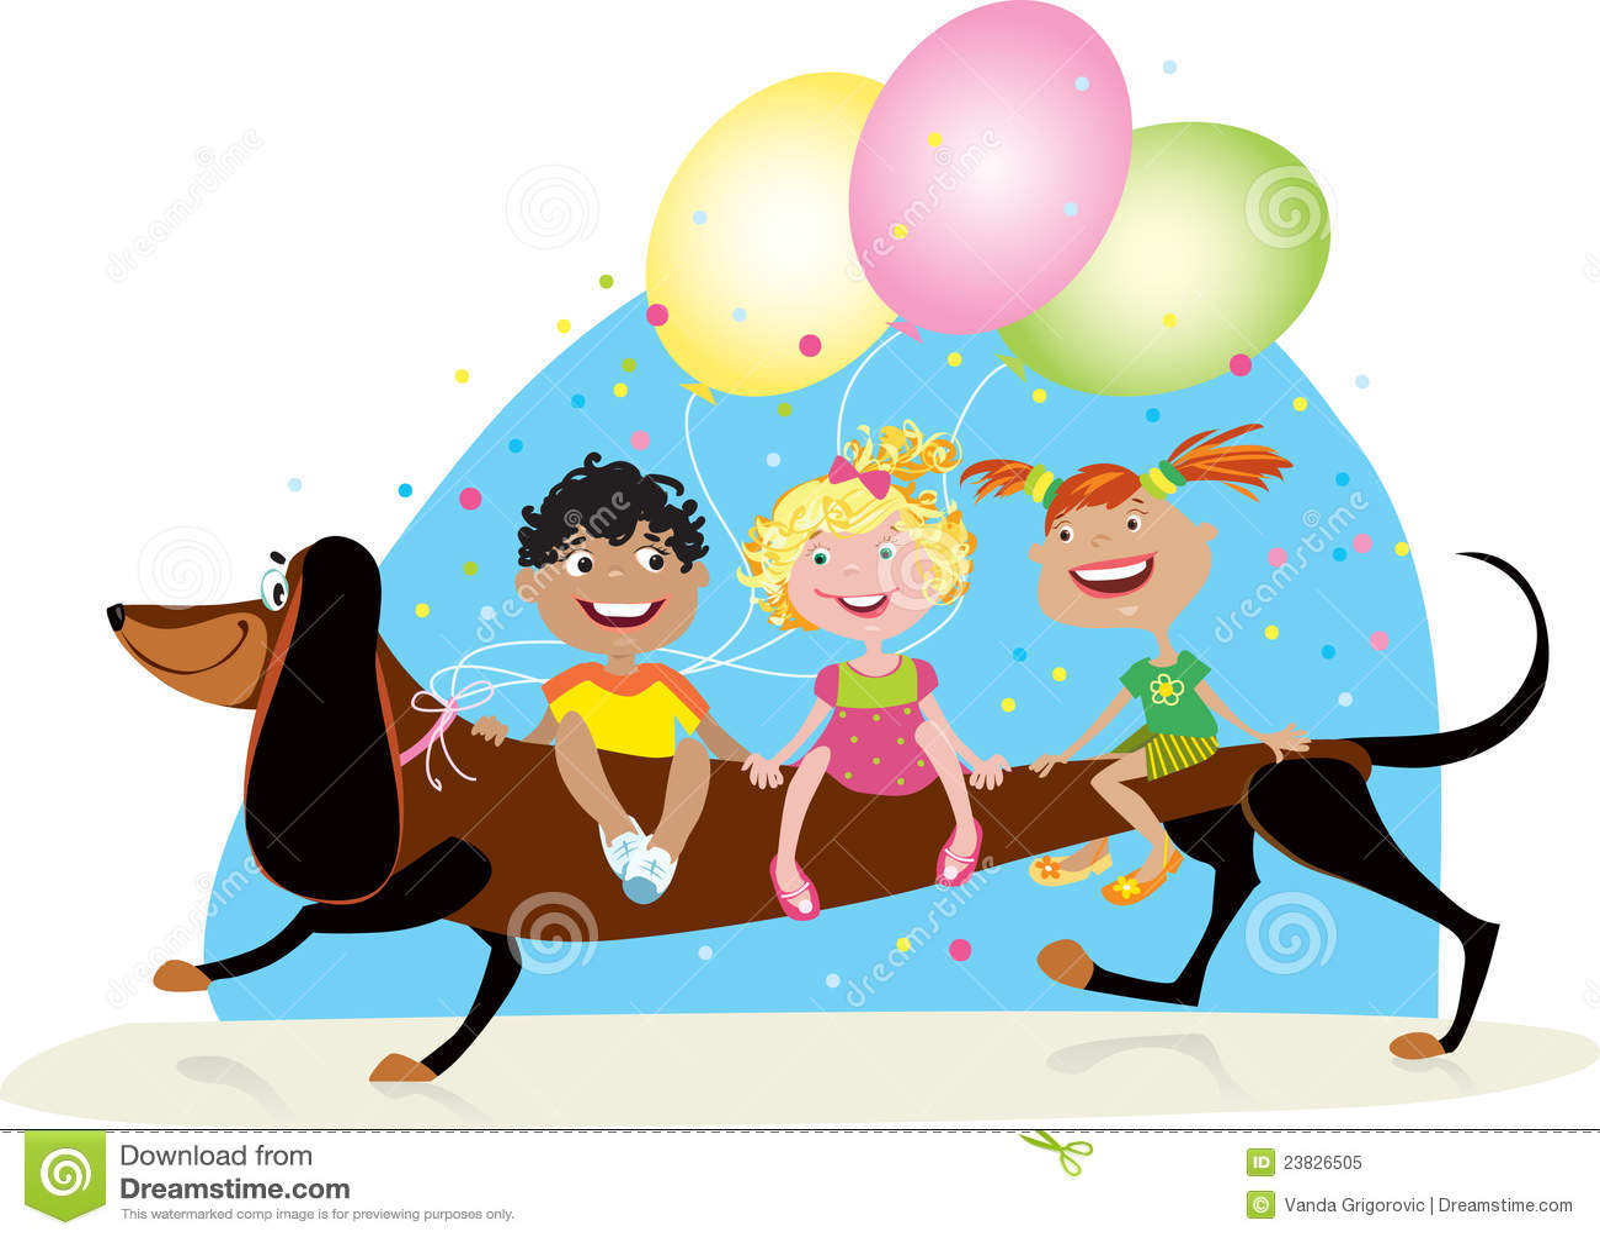 Children riding dog